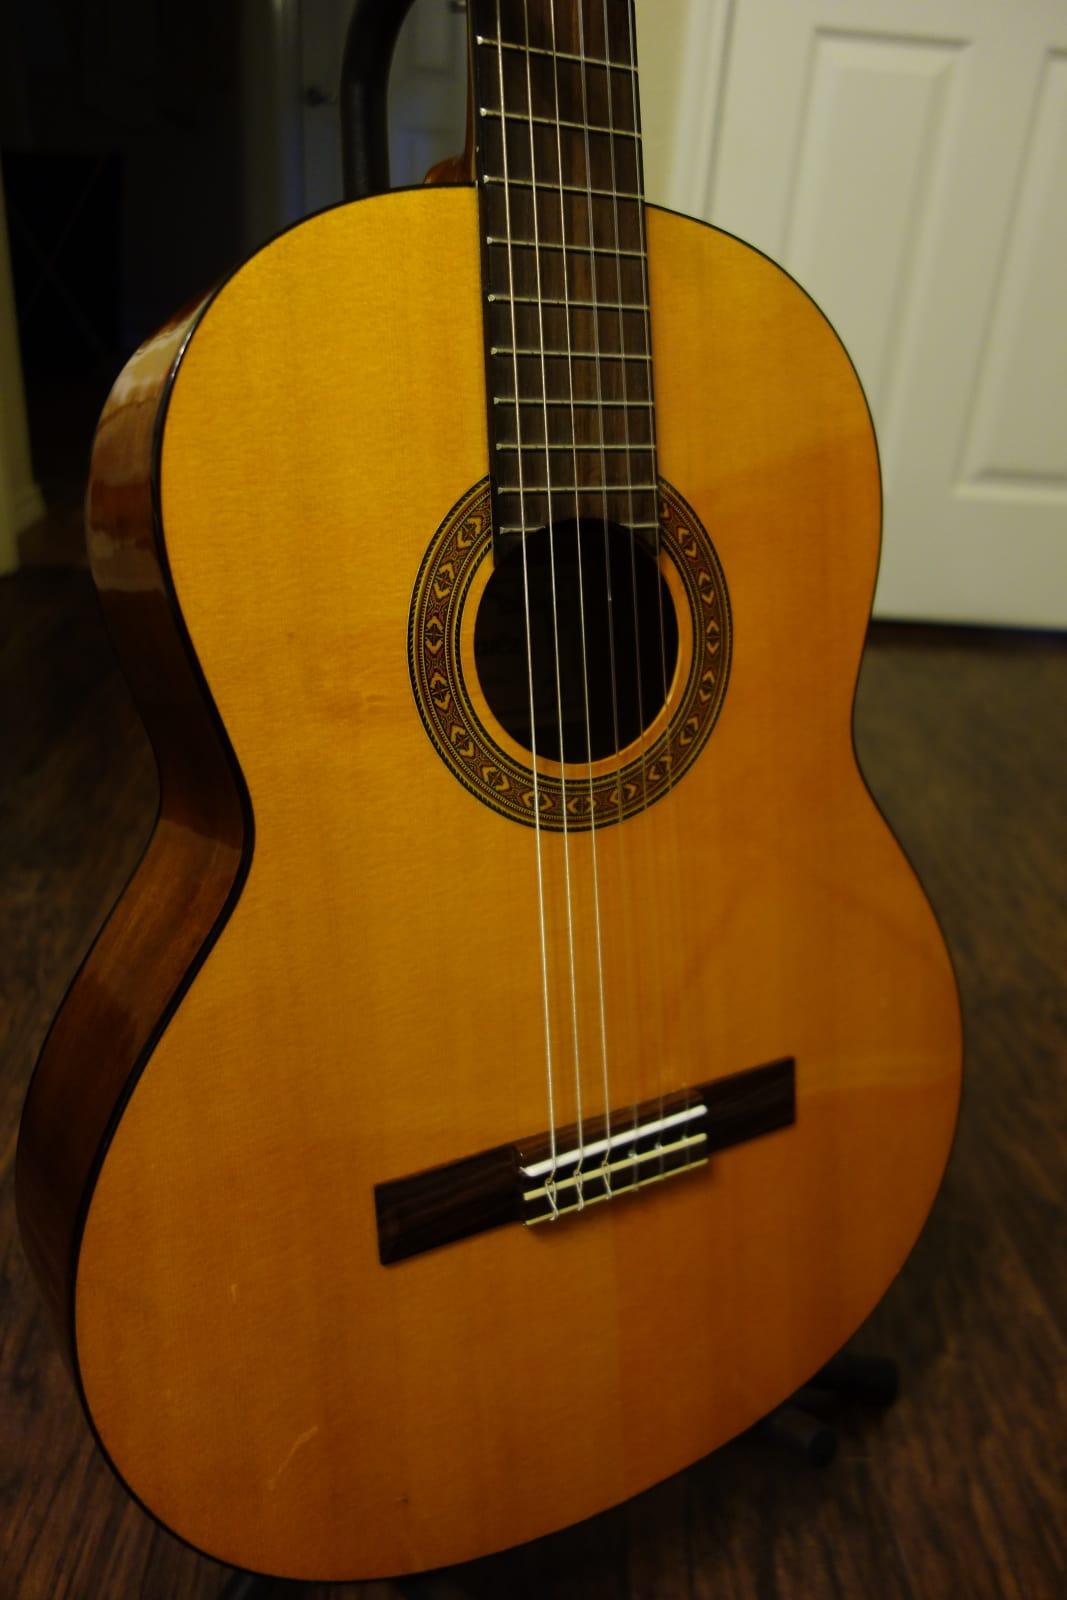 alvarez rc 10 nylon string classical acoustic guitar reverb. Black Bedroom Furniture Sets. Home Design Ideas